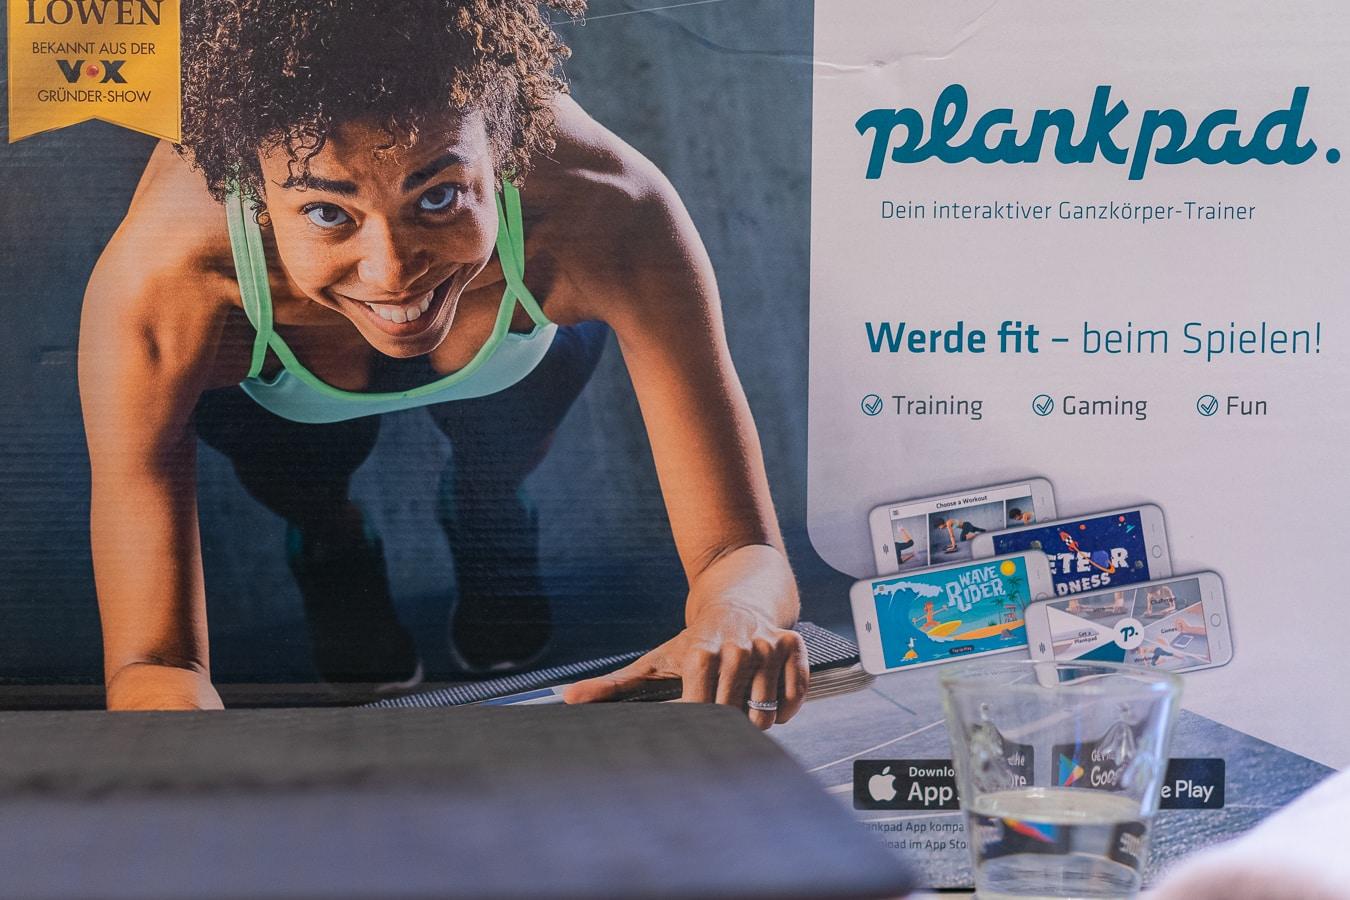 Plankpad - Training für den ganzen Körper